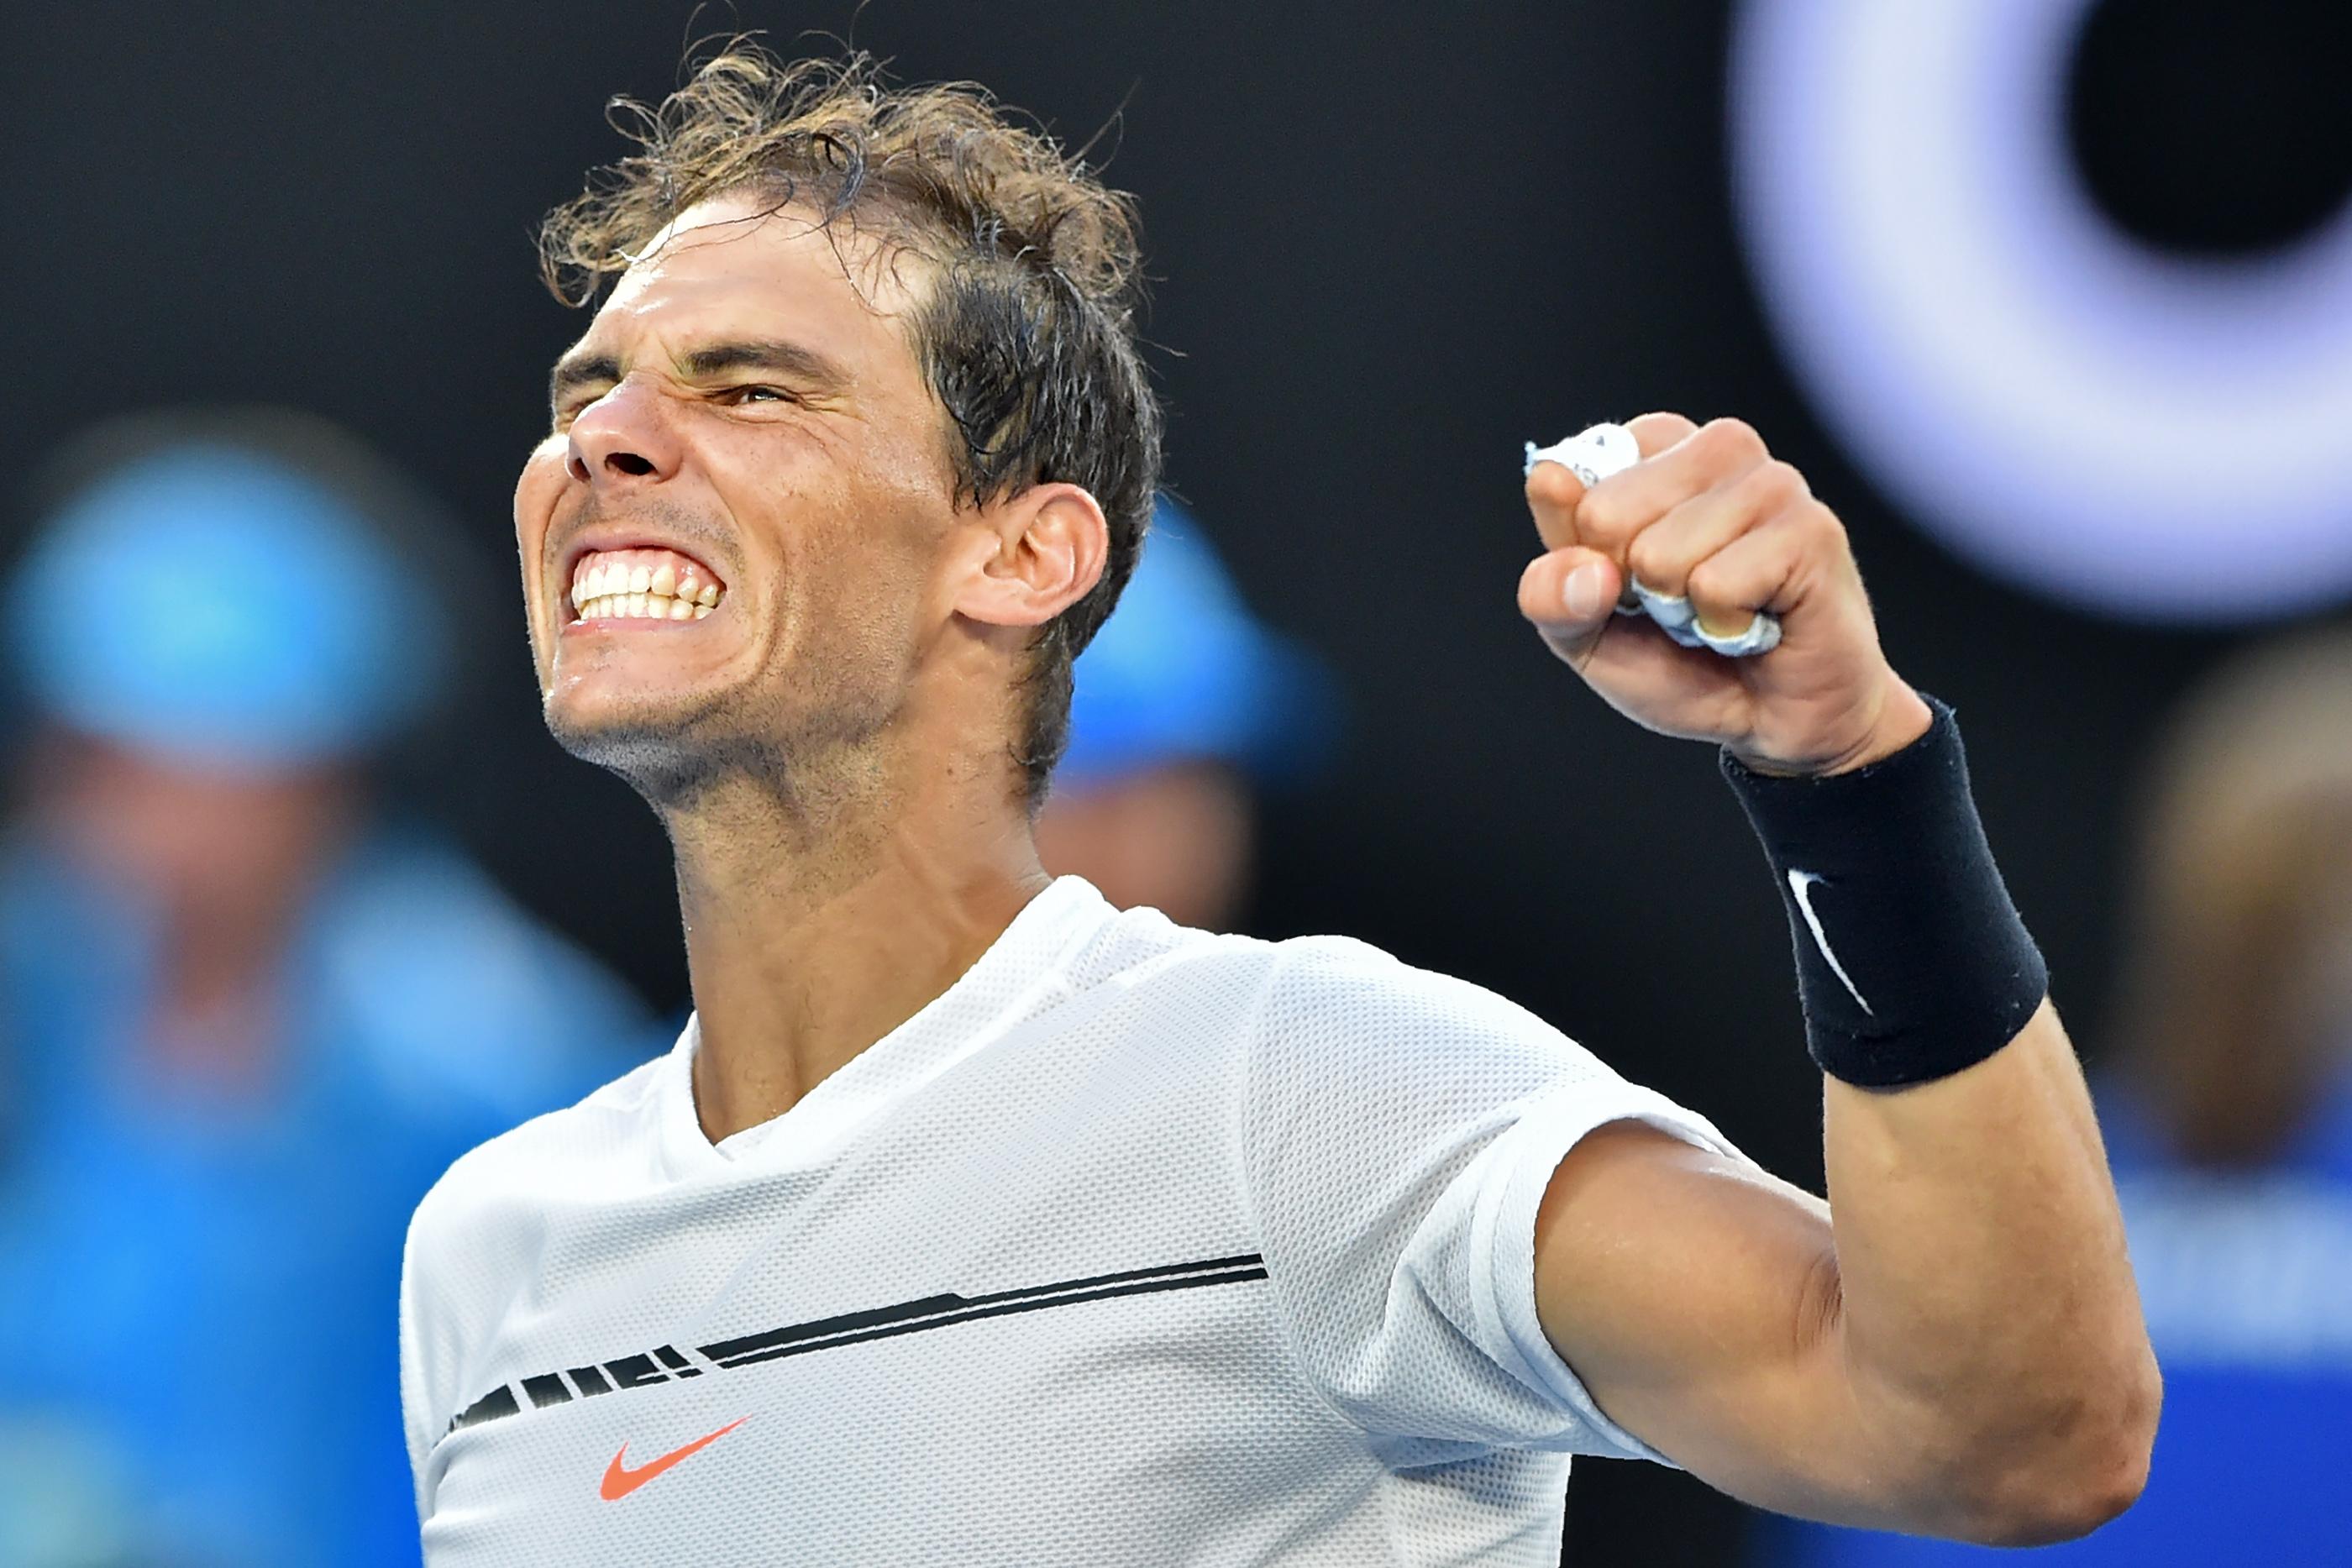 Tennis - Open Australie - Rafael Nadal, la fureur de revivre